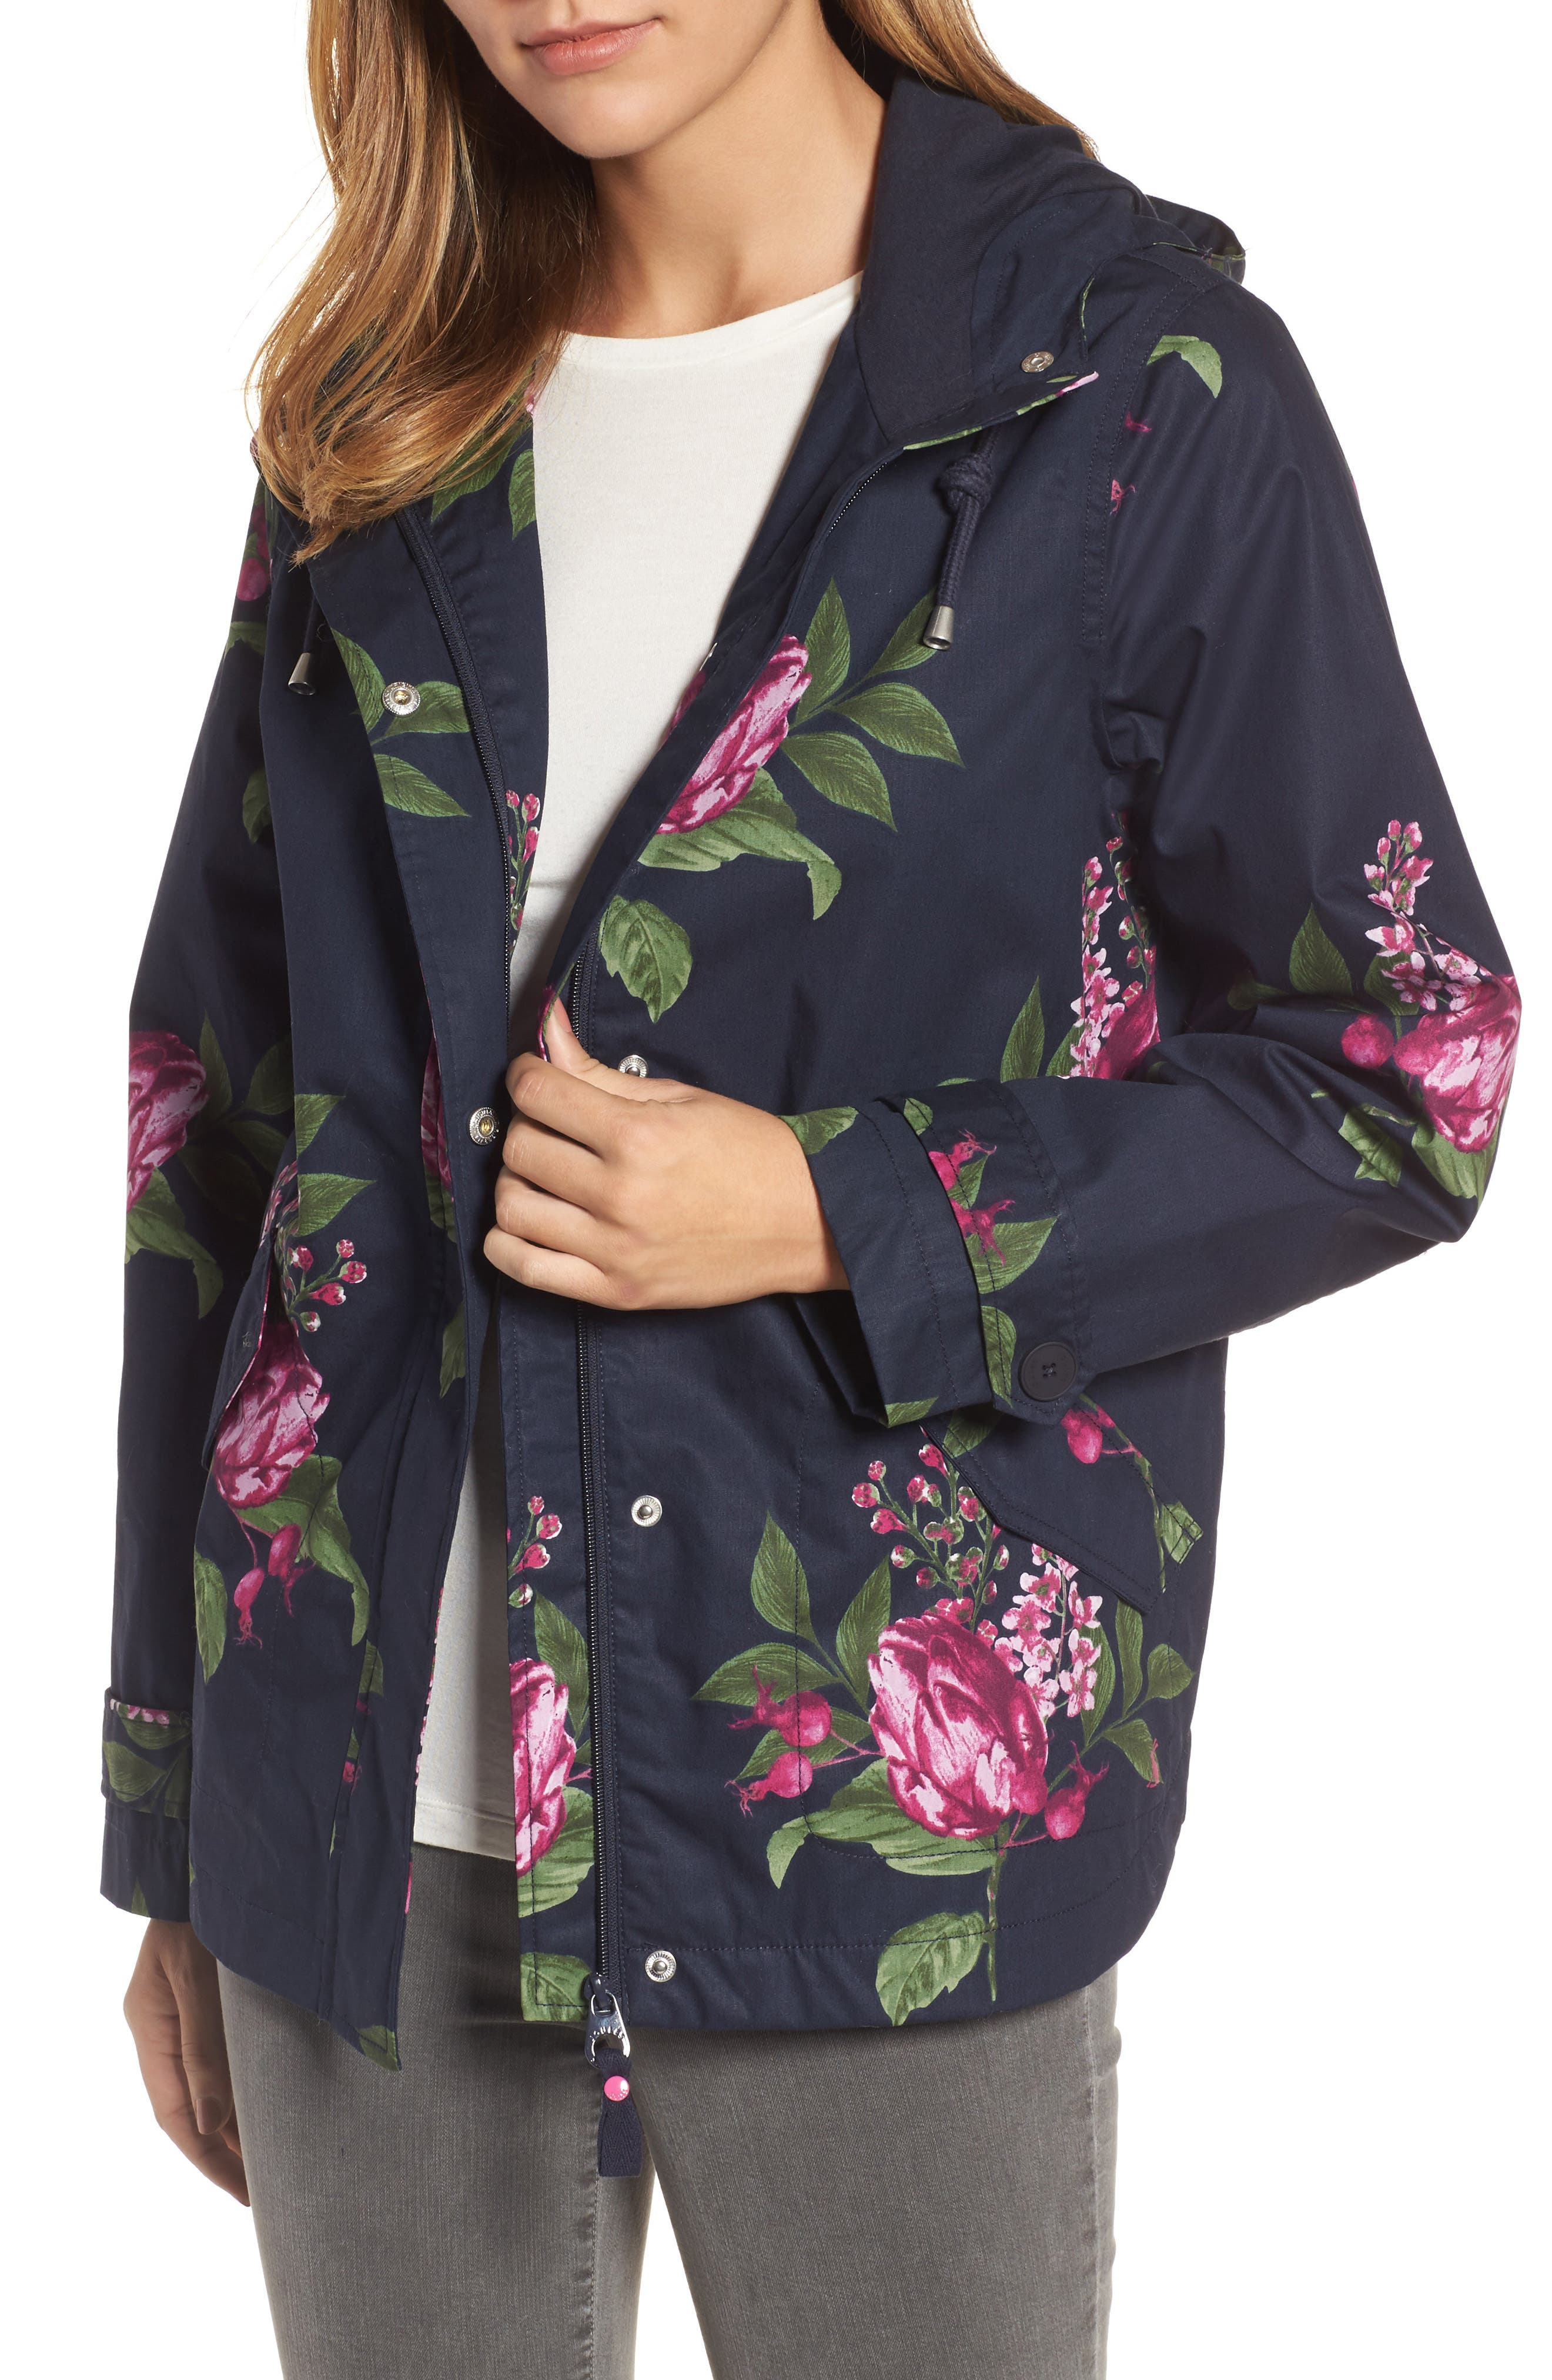 Main Image - Joules Right as Rain Print Waterproof Hooded Jacket